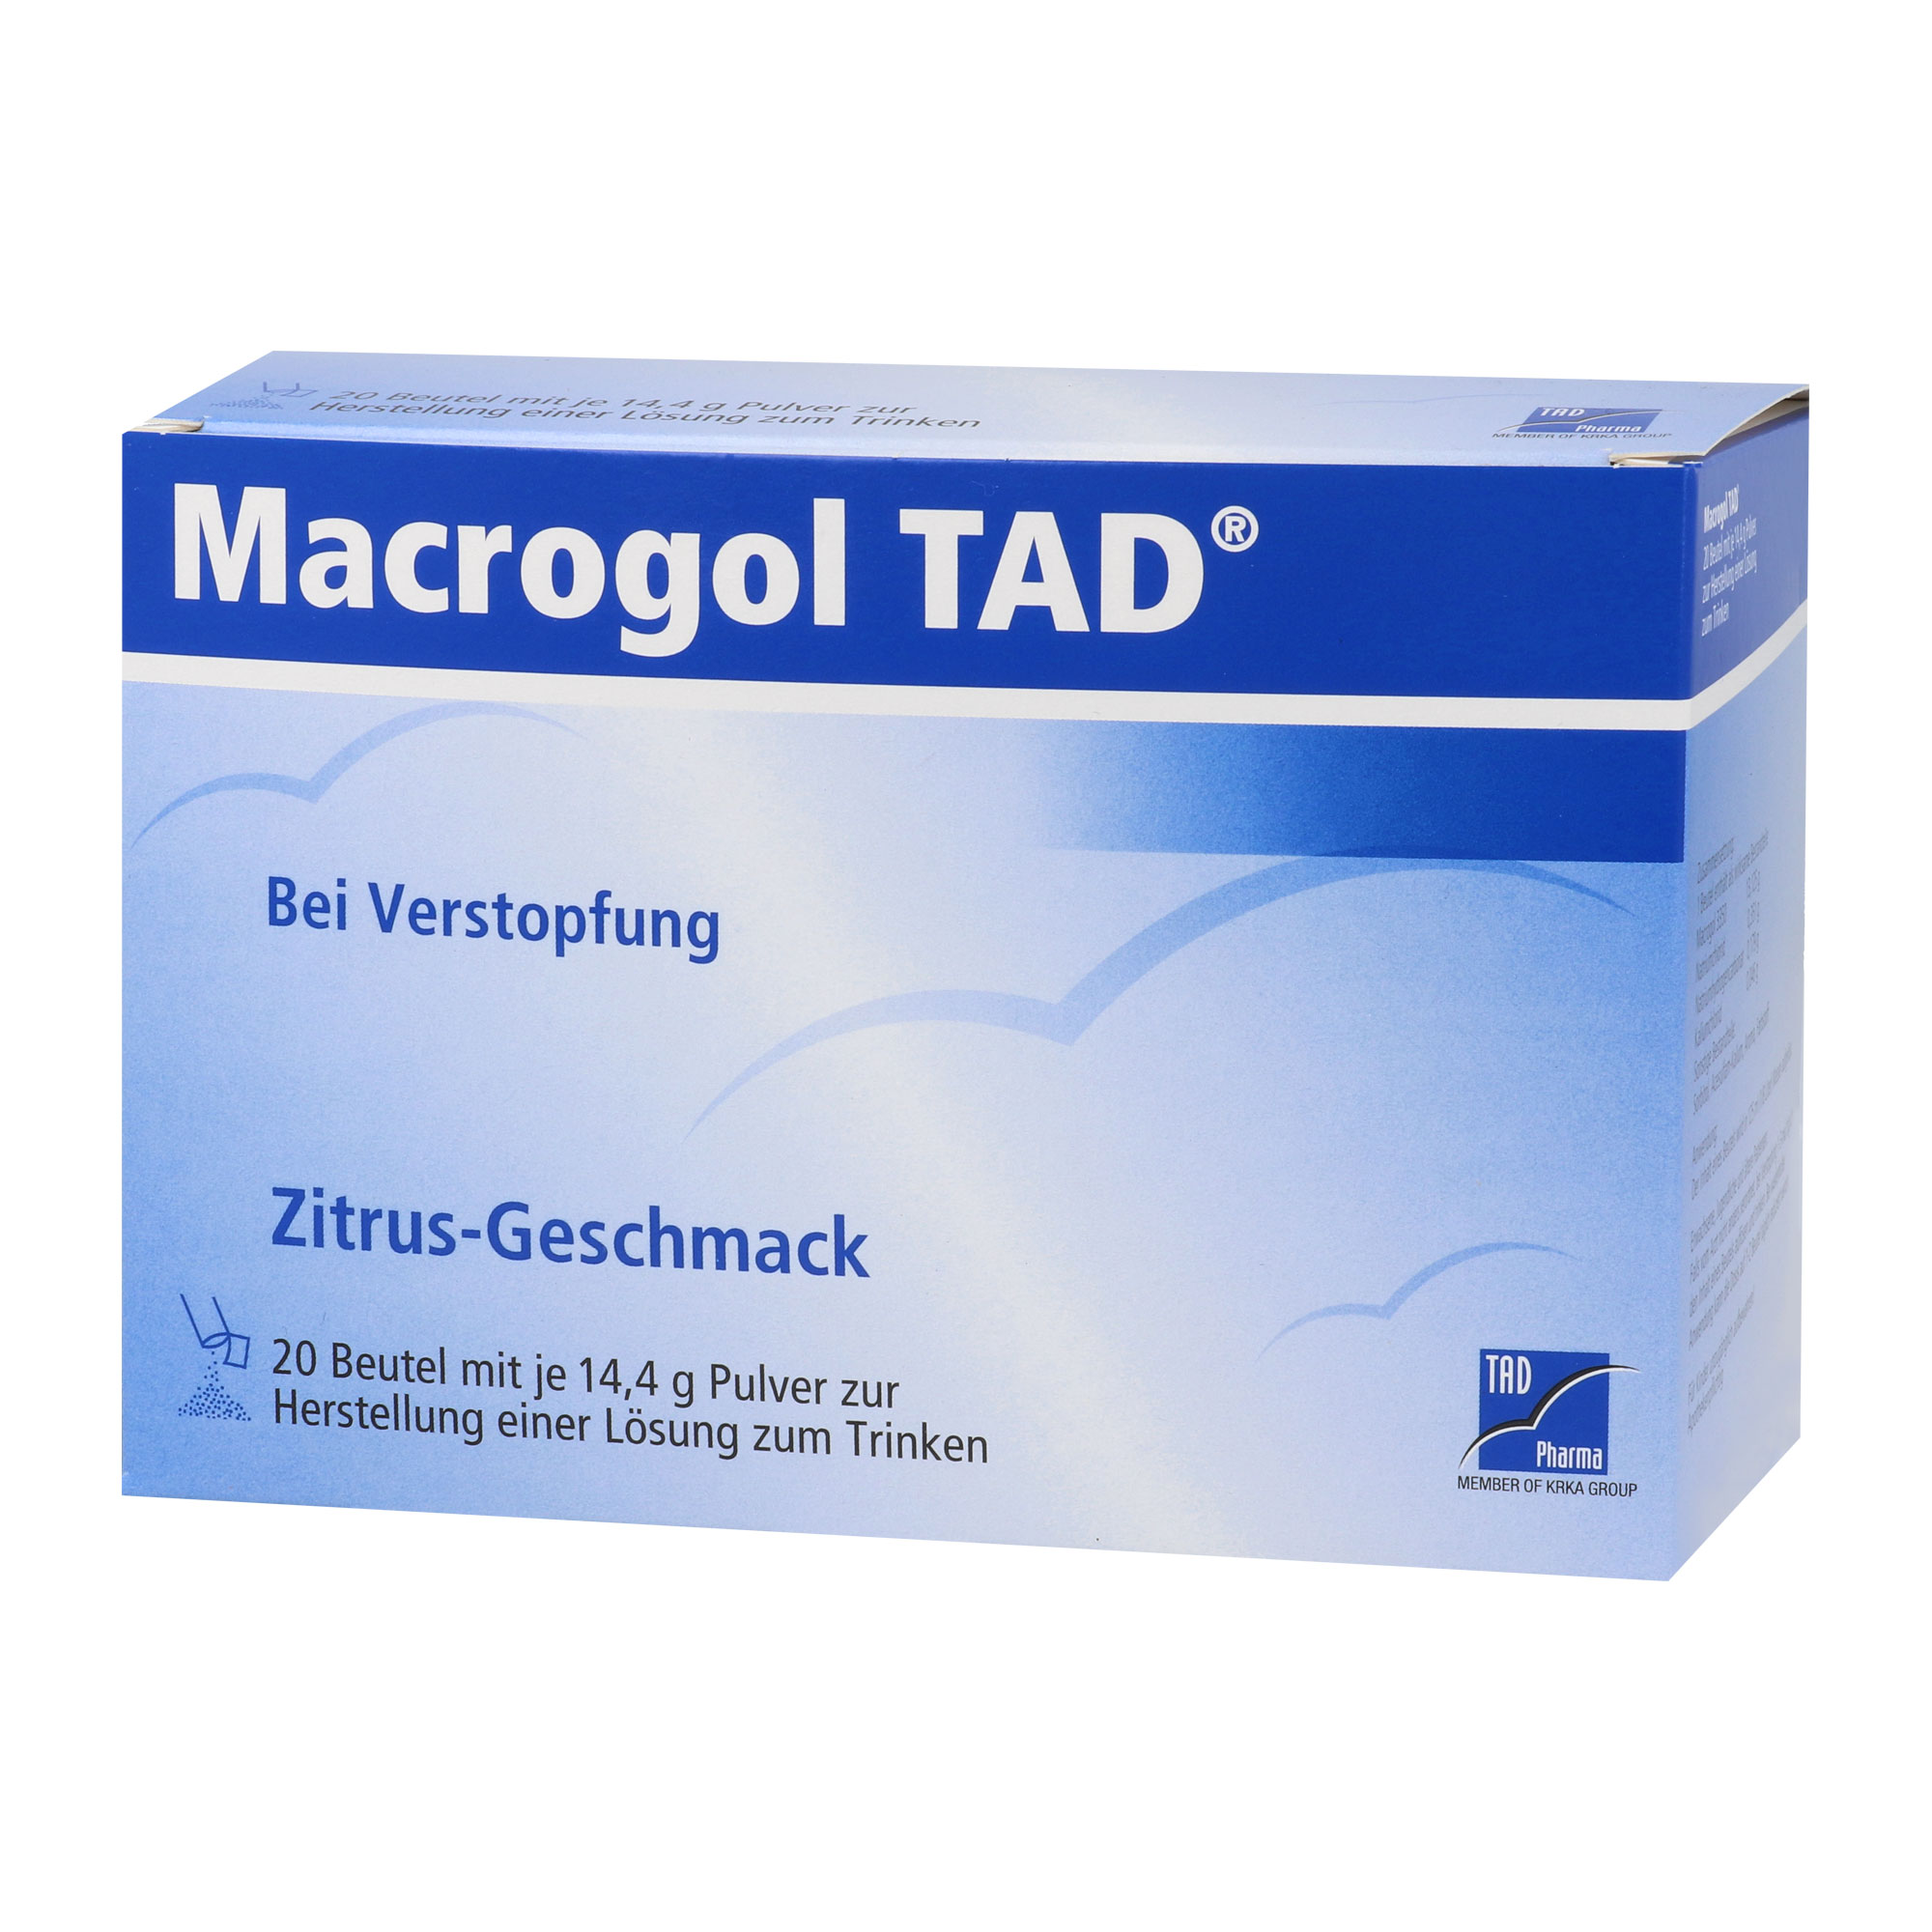 Macrogol TAD